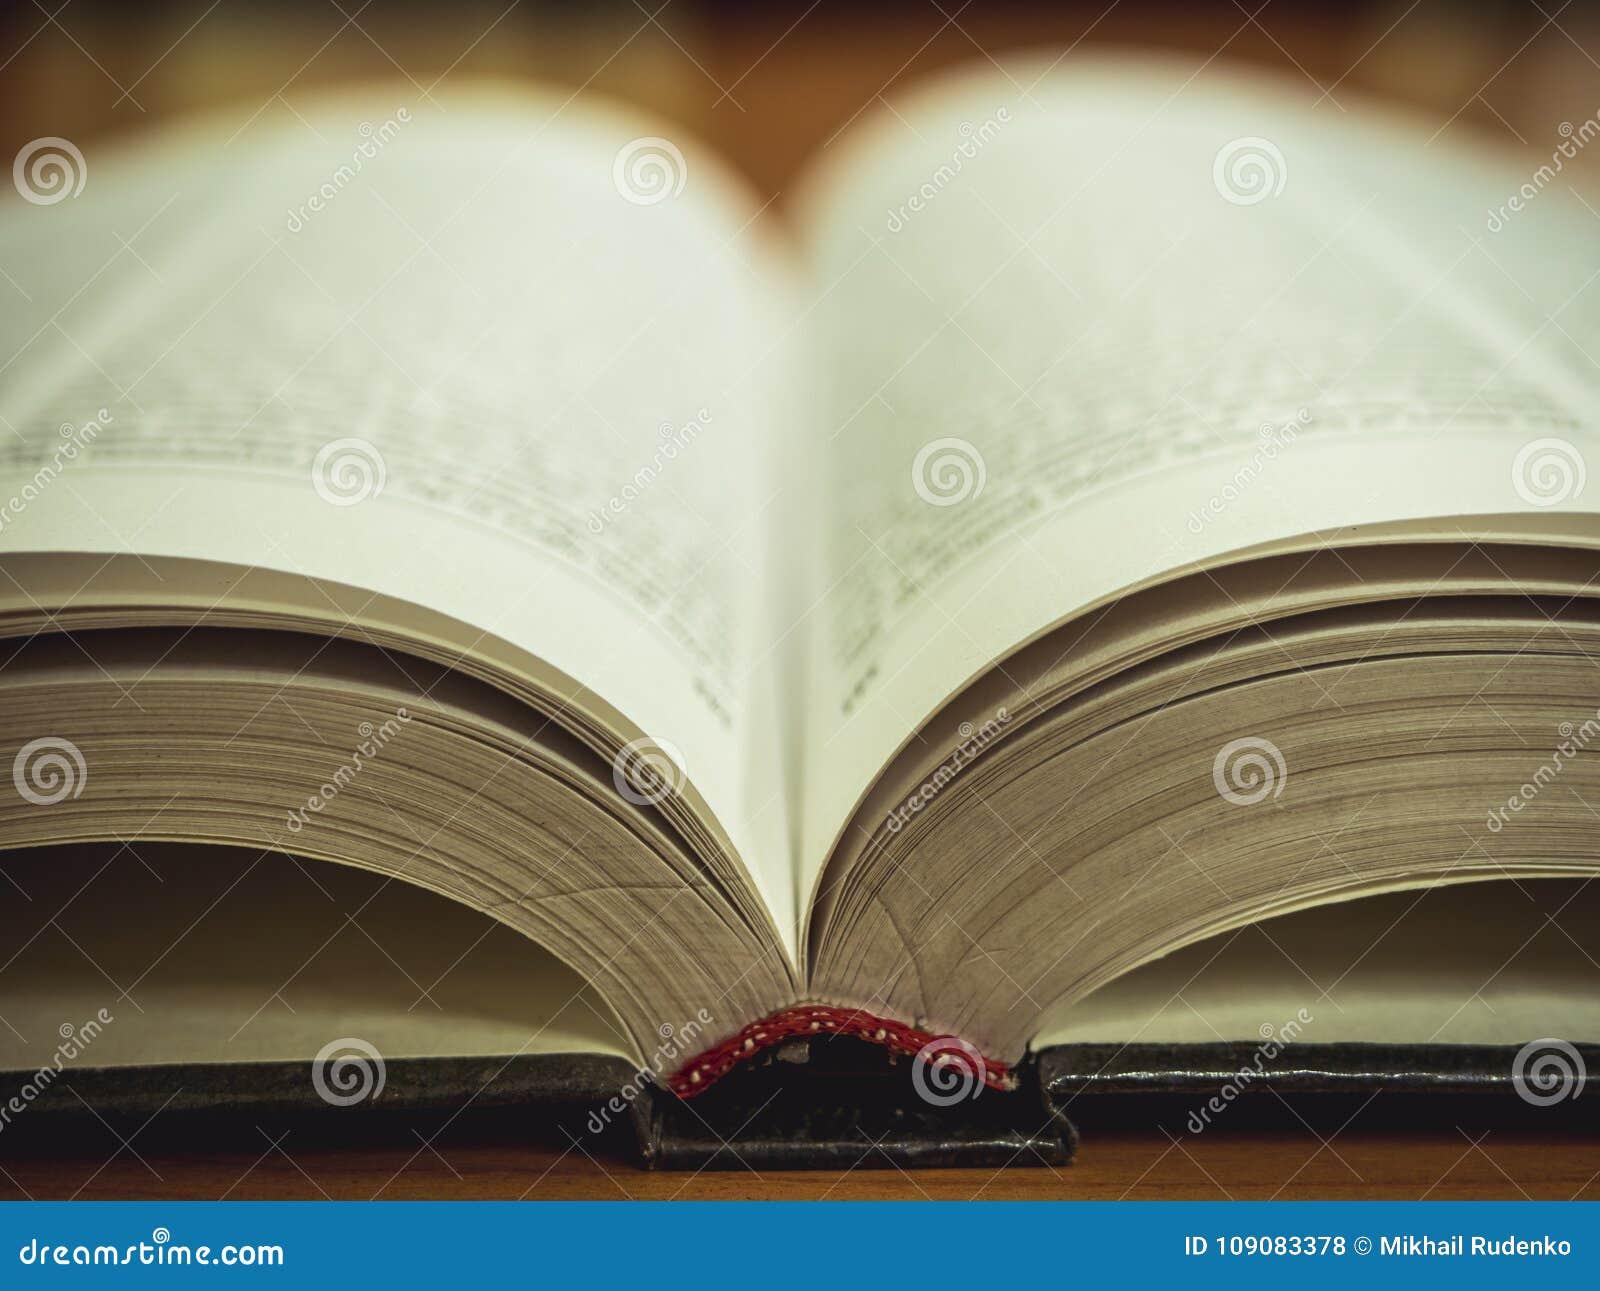 Съемка макроса раскрытой книги на таблице